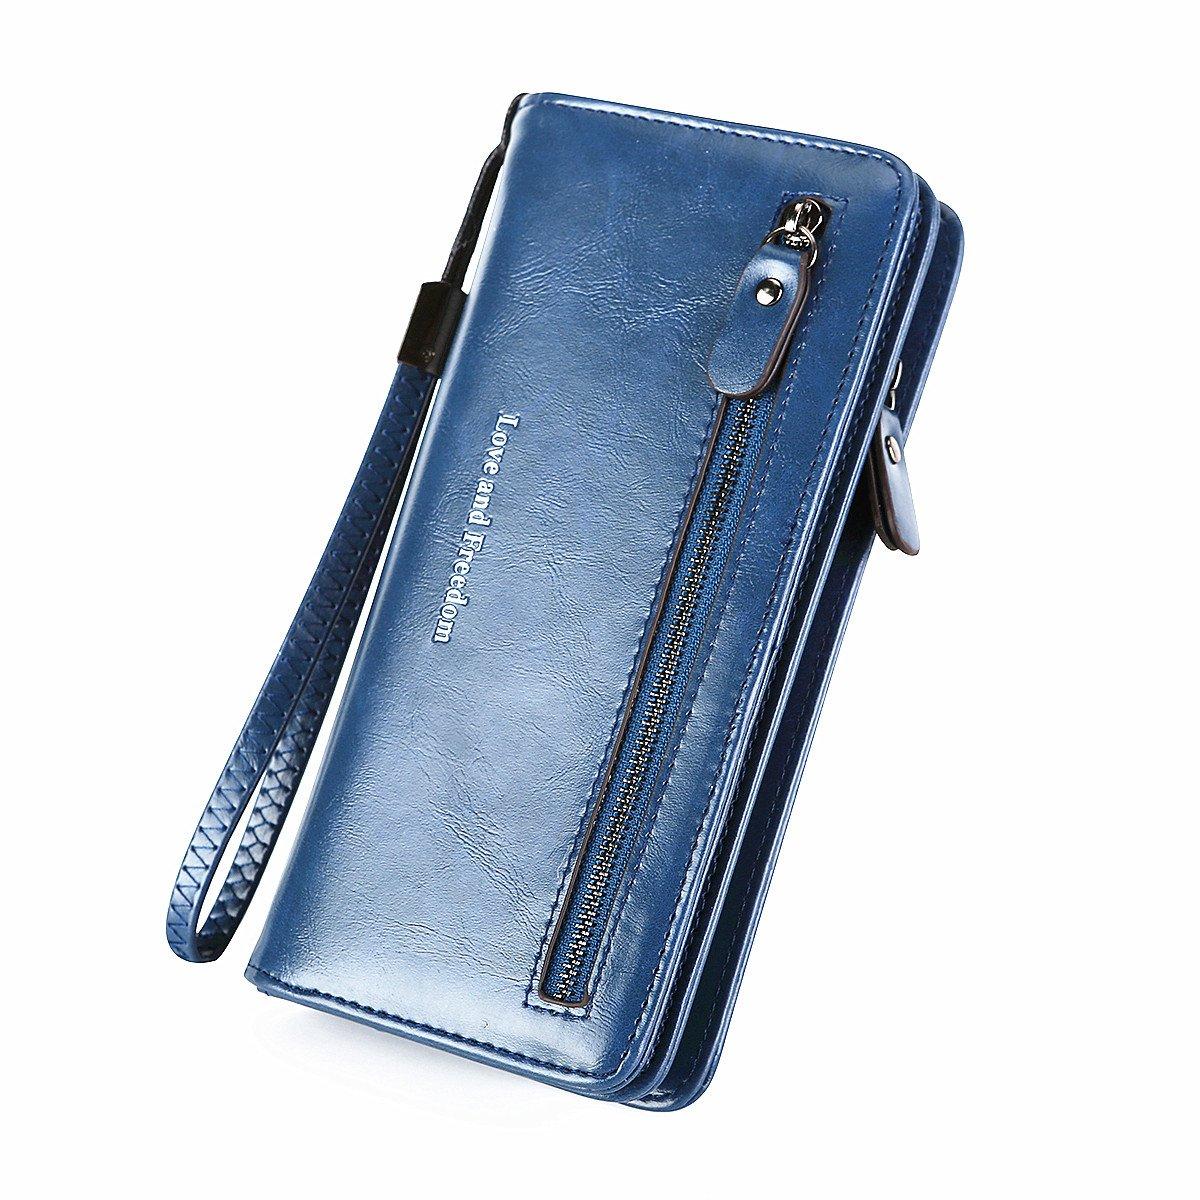 RFID Wallets for Women Wristlet Leather Clutch Travel Purse Long Zipper Multi Card Organizer (Dark blue)